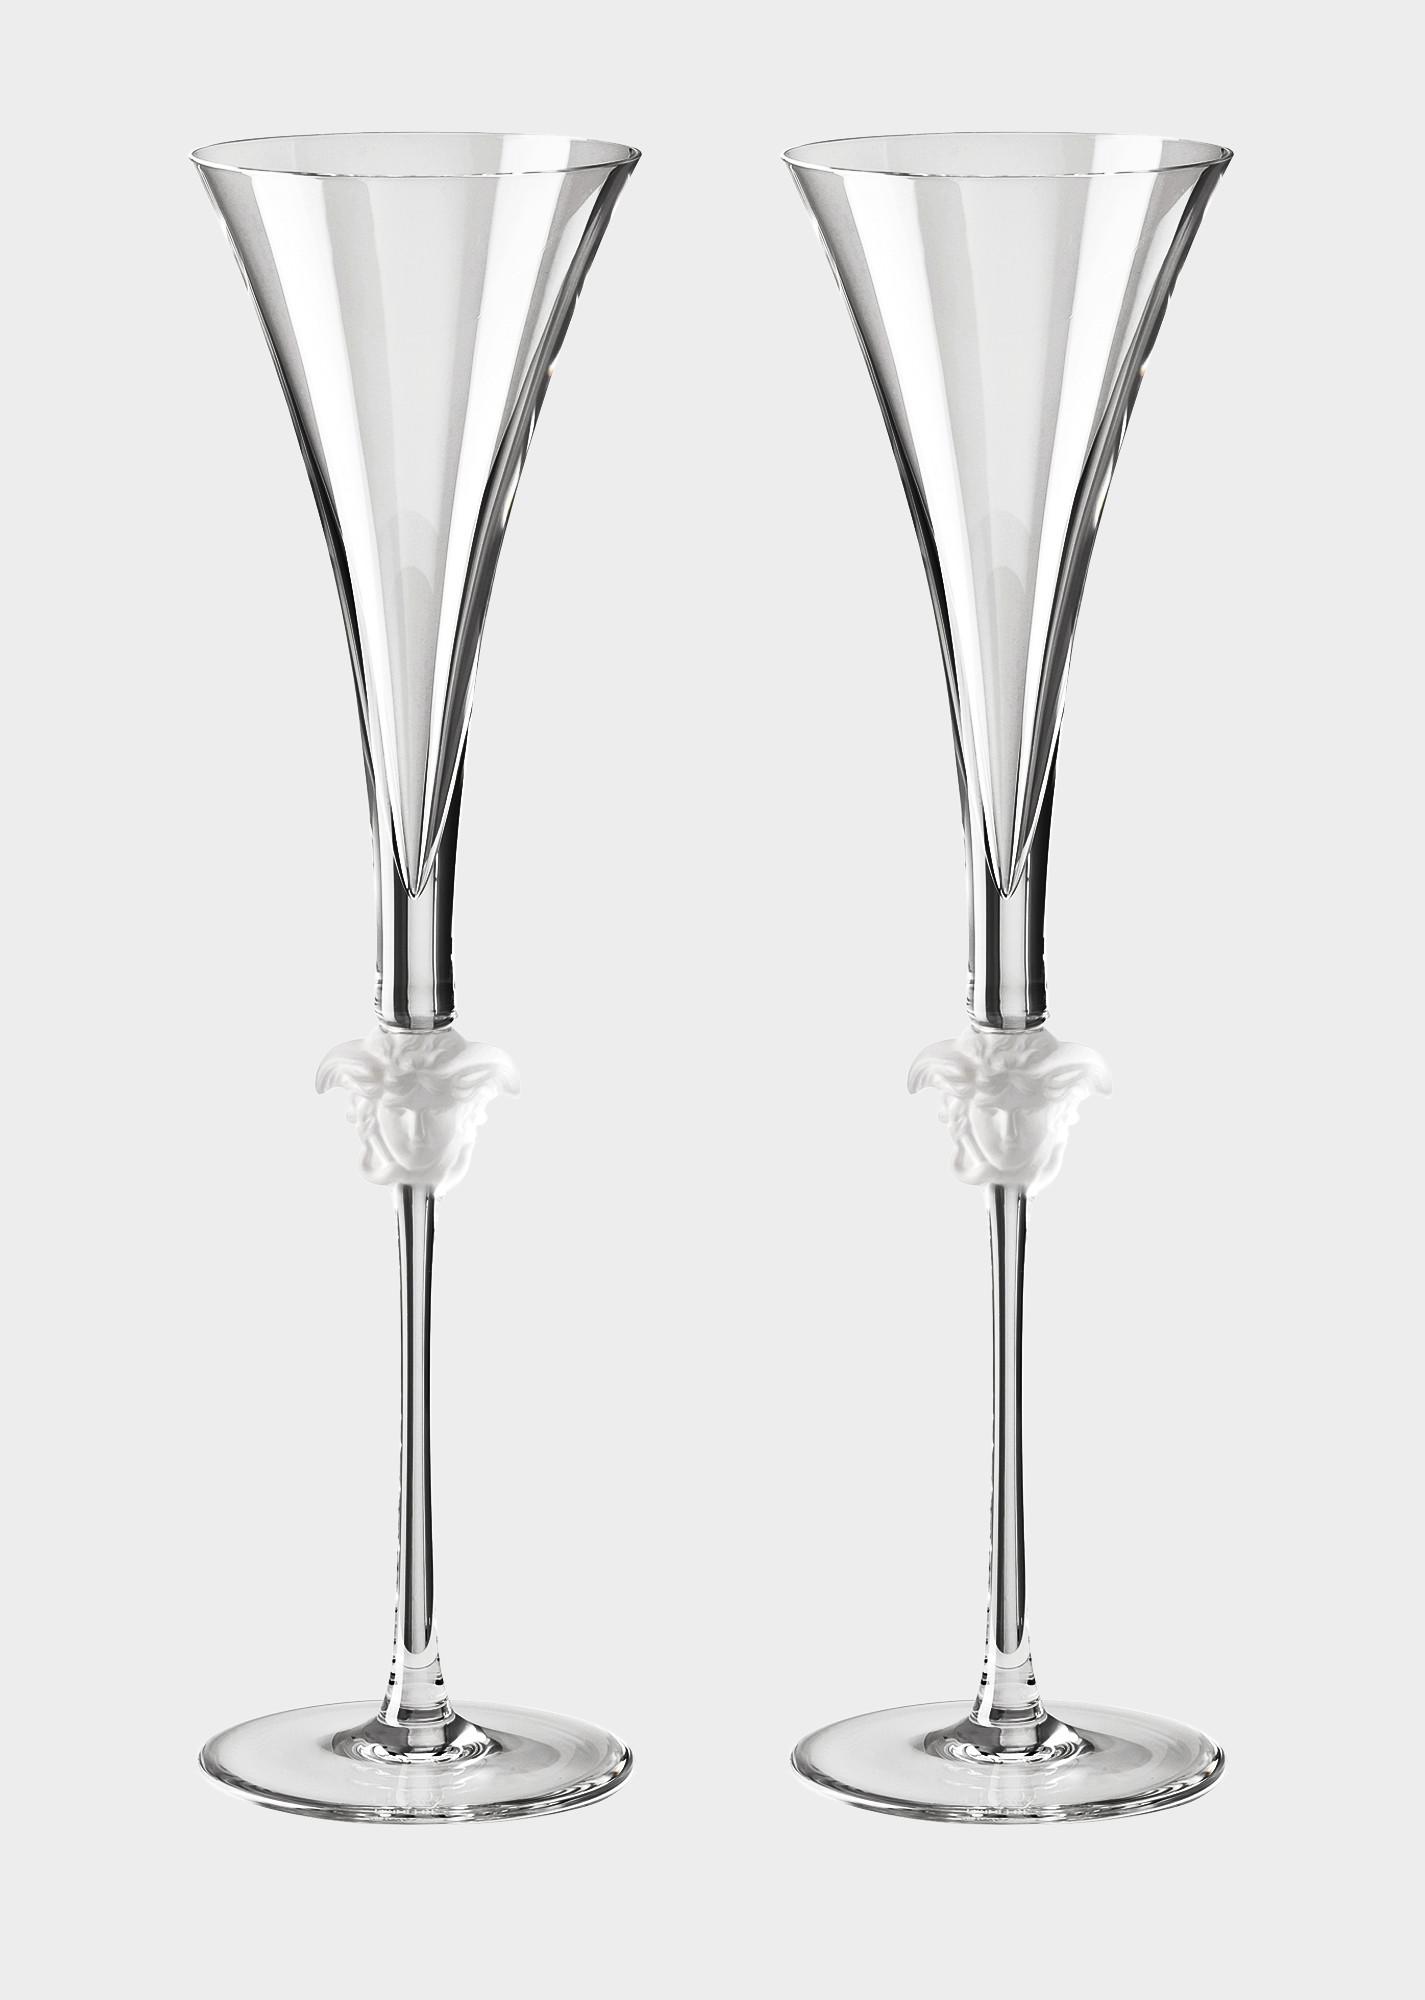 large margarita glass vase of versace home luxury glass crystal official website inside 90 n48804 n110835 n2066 20 medusalumieregb2champagneflute glassandcrystal versace online store 1 0